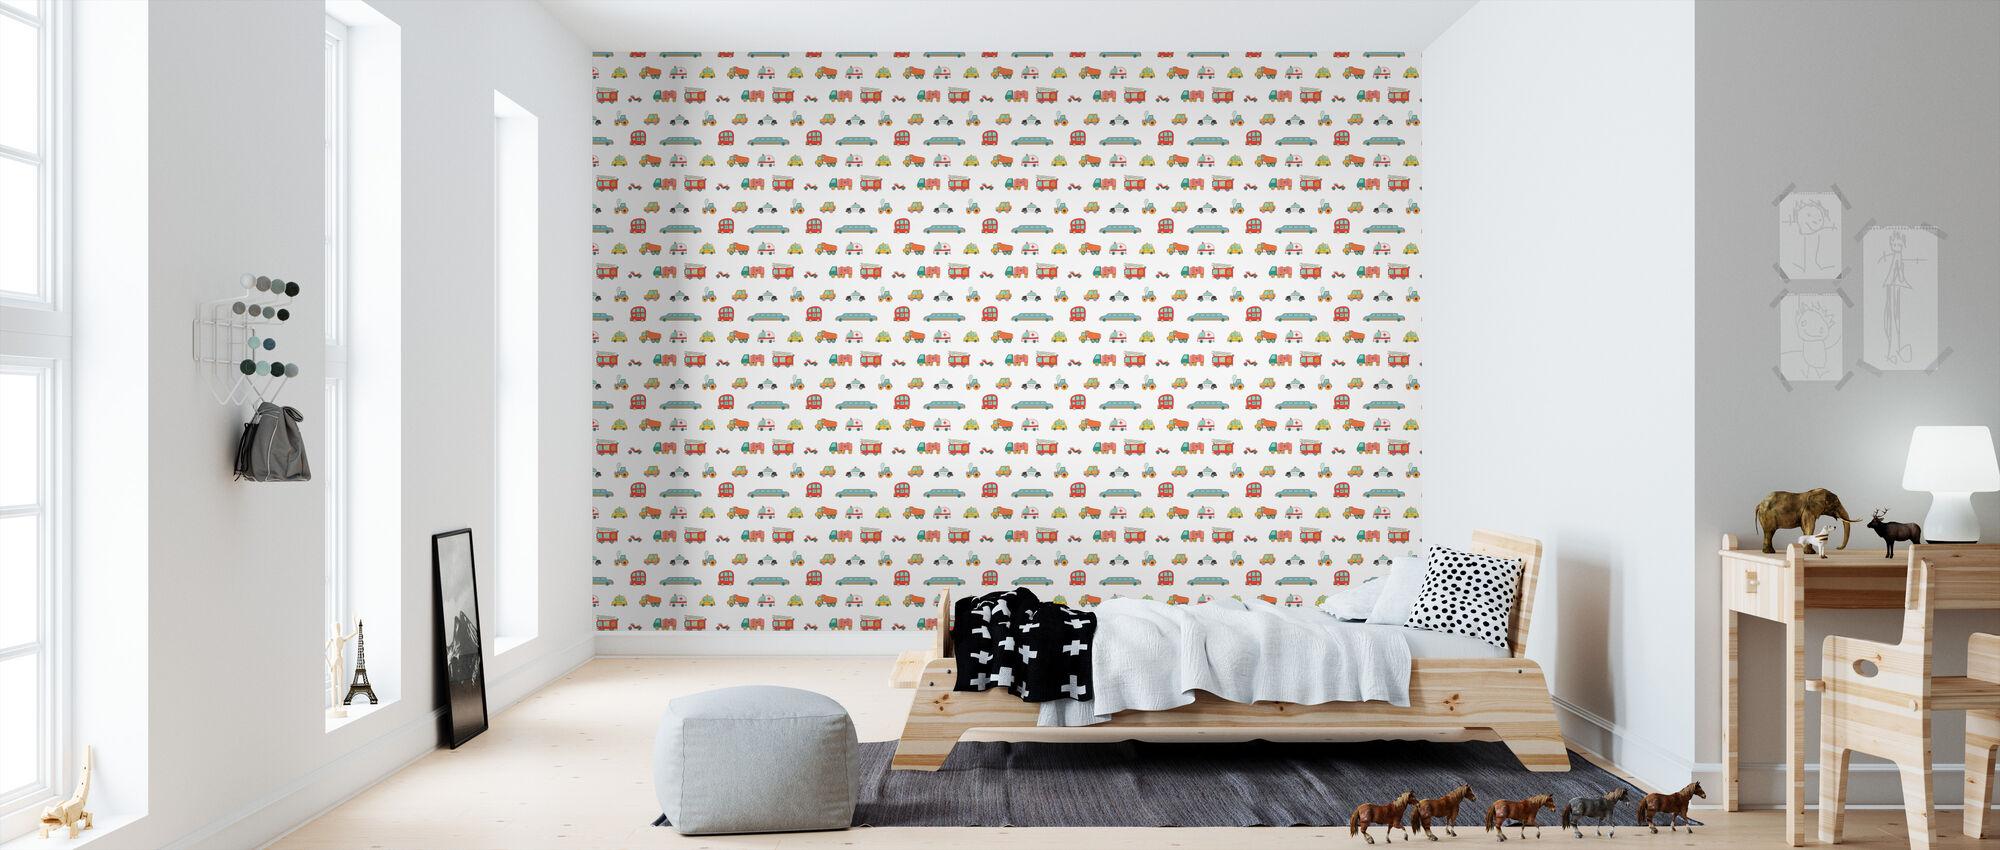 Auto - Wallpaper - Kids Room